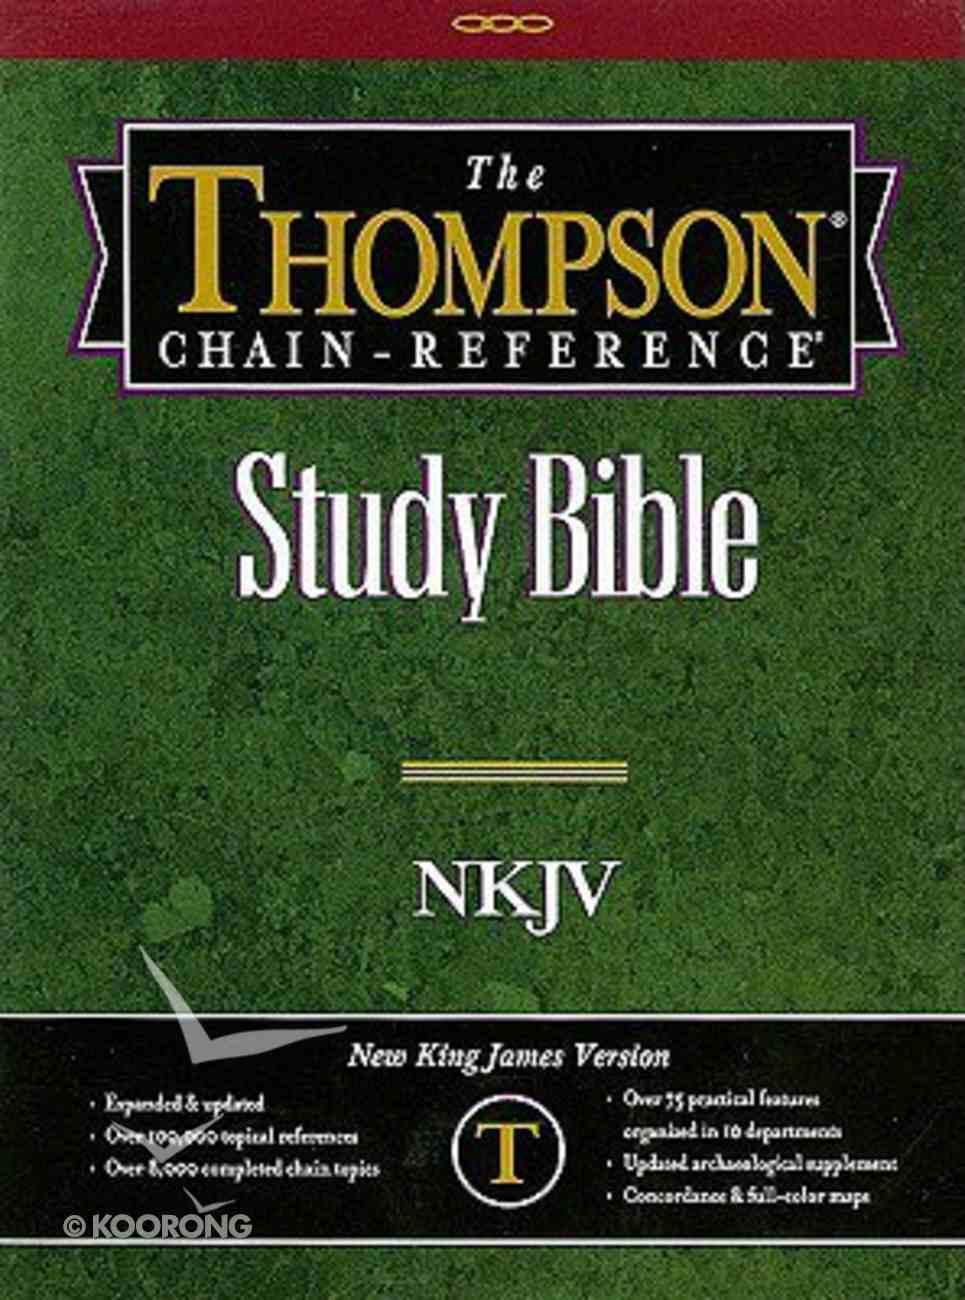 NKJV Thompson Chain Burgundy Genuine Leather